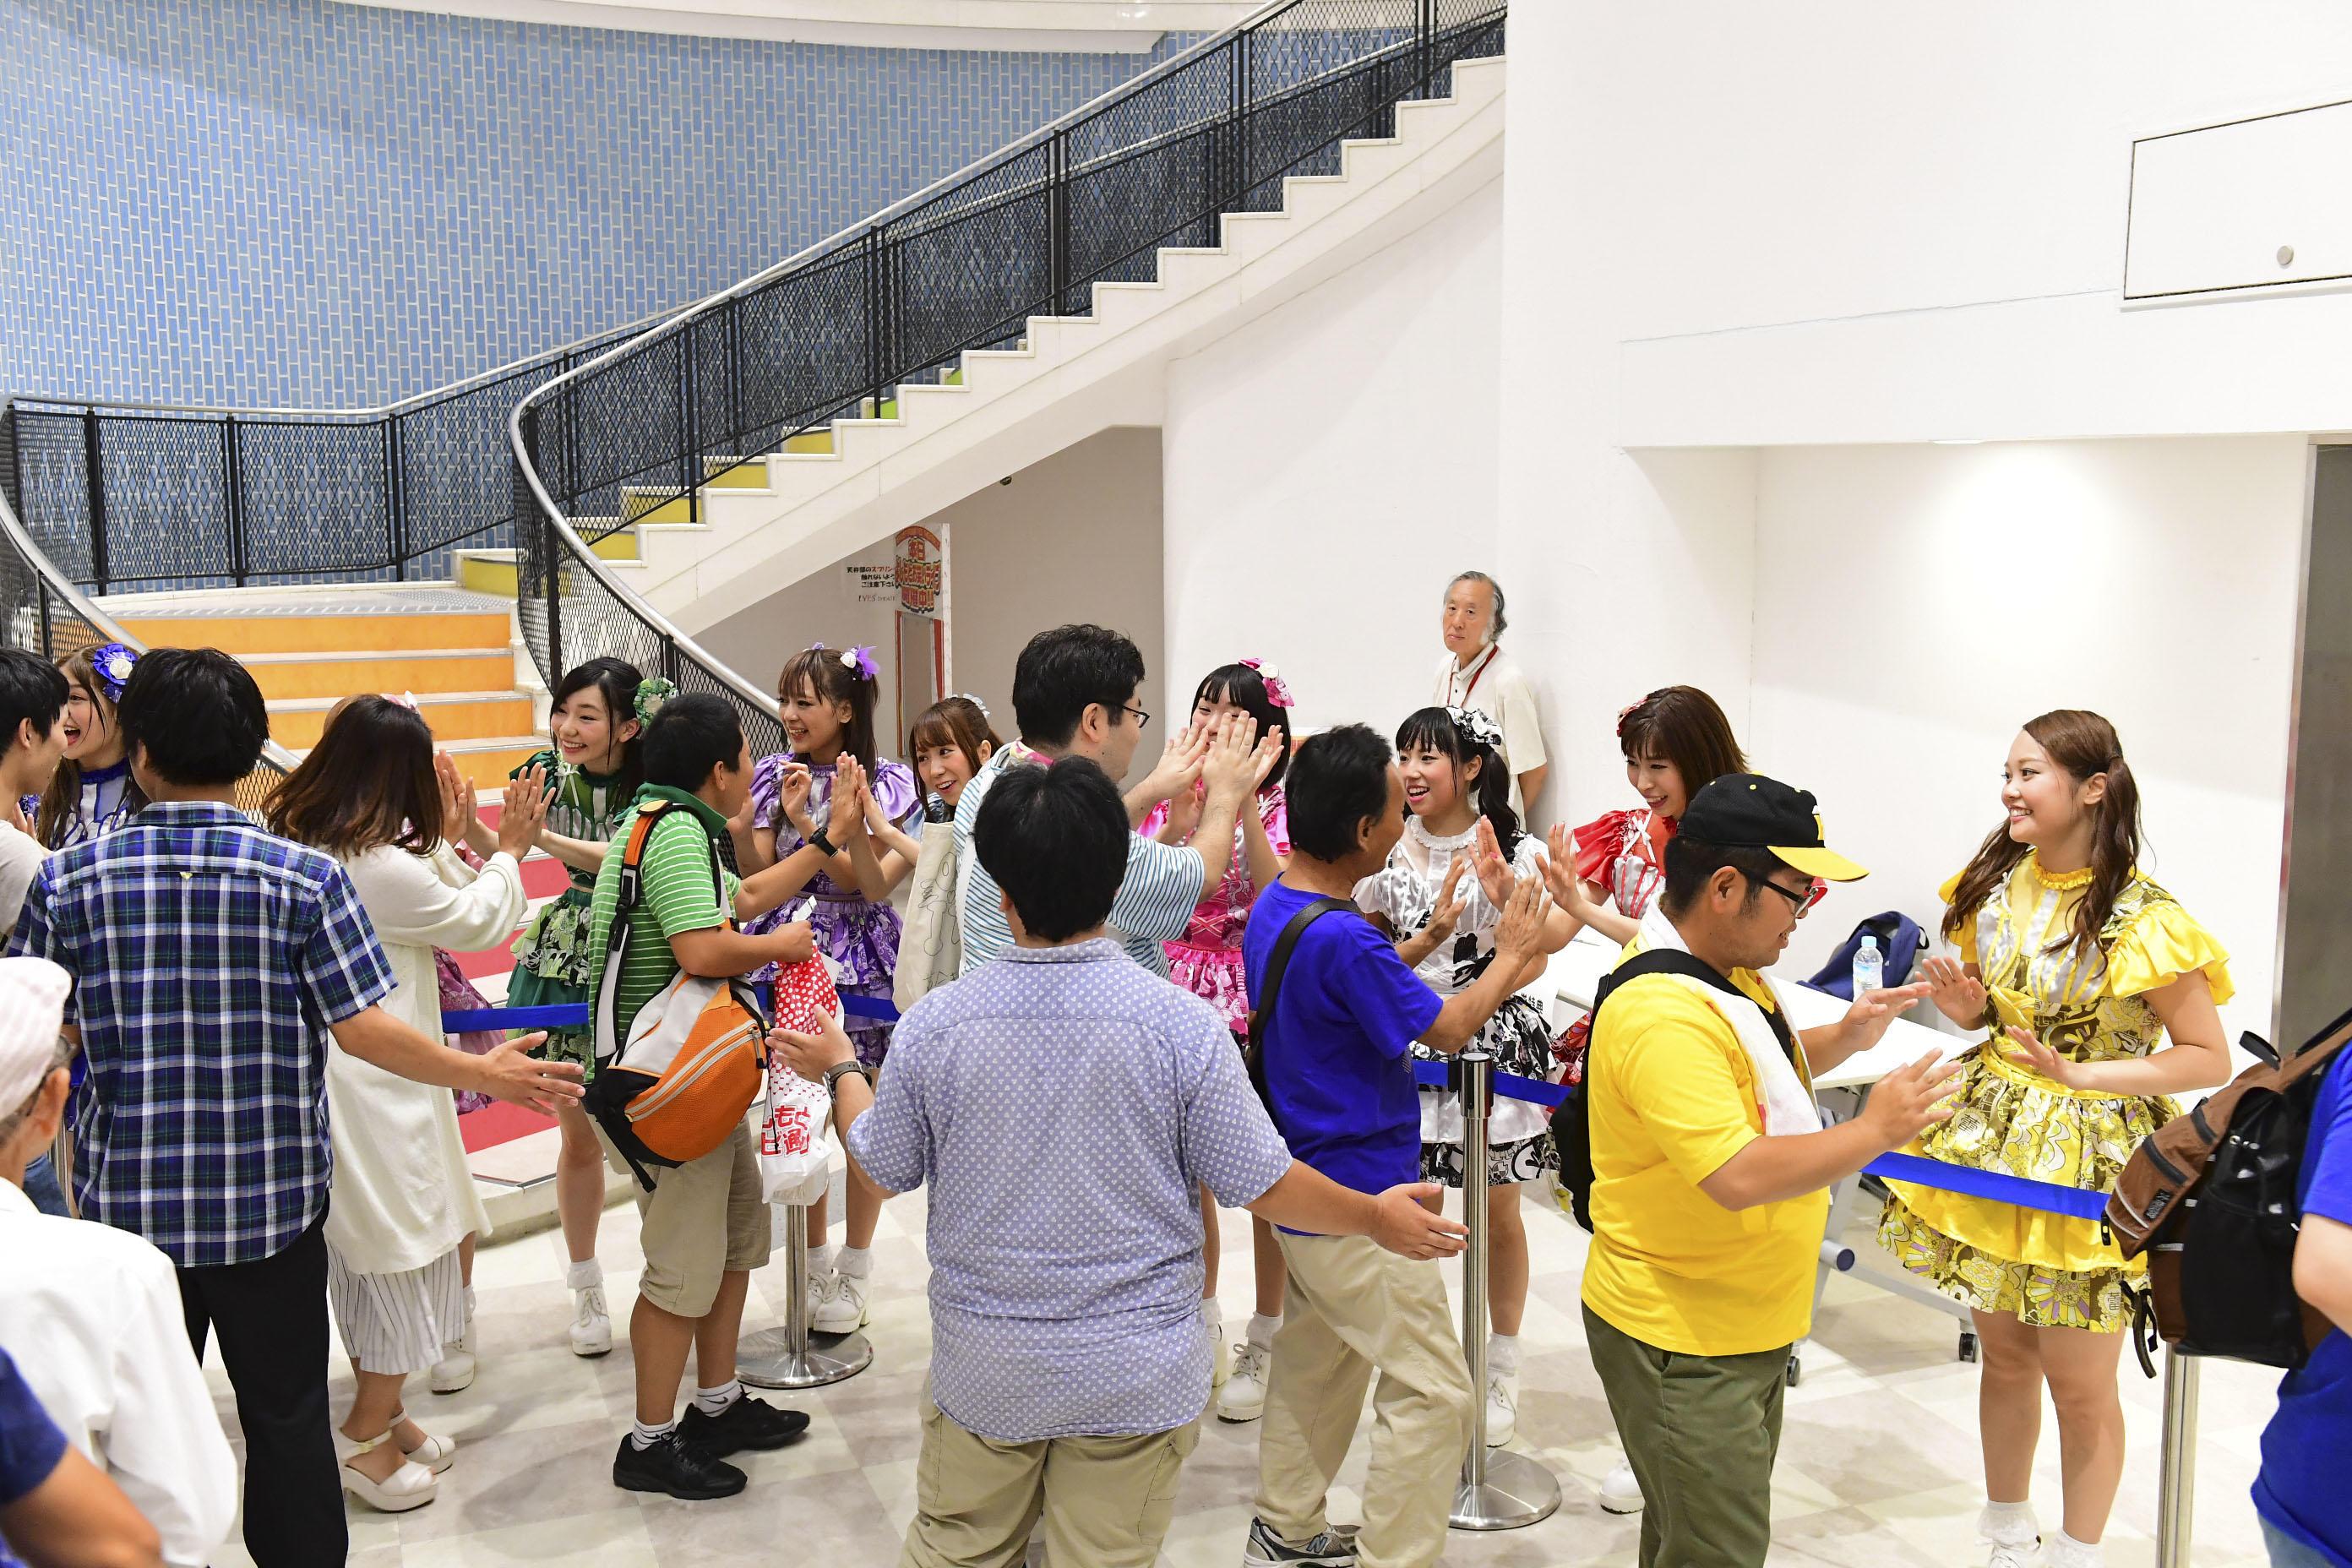 http://news.yoshimoto.co.jp/20170911121520-3a43d6ad7306e67350501412106e09cec93cbf54.jpg